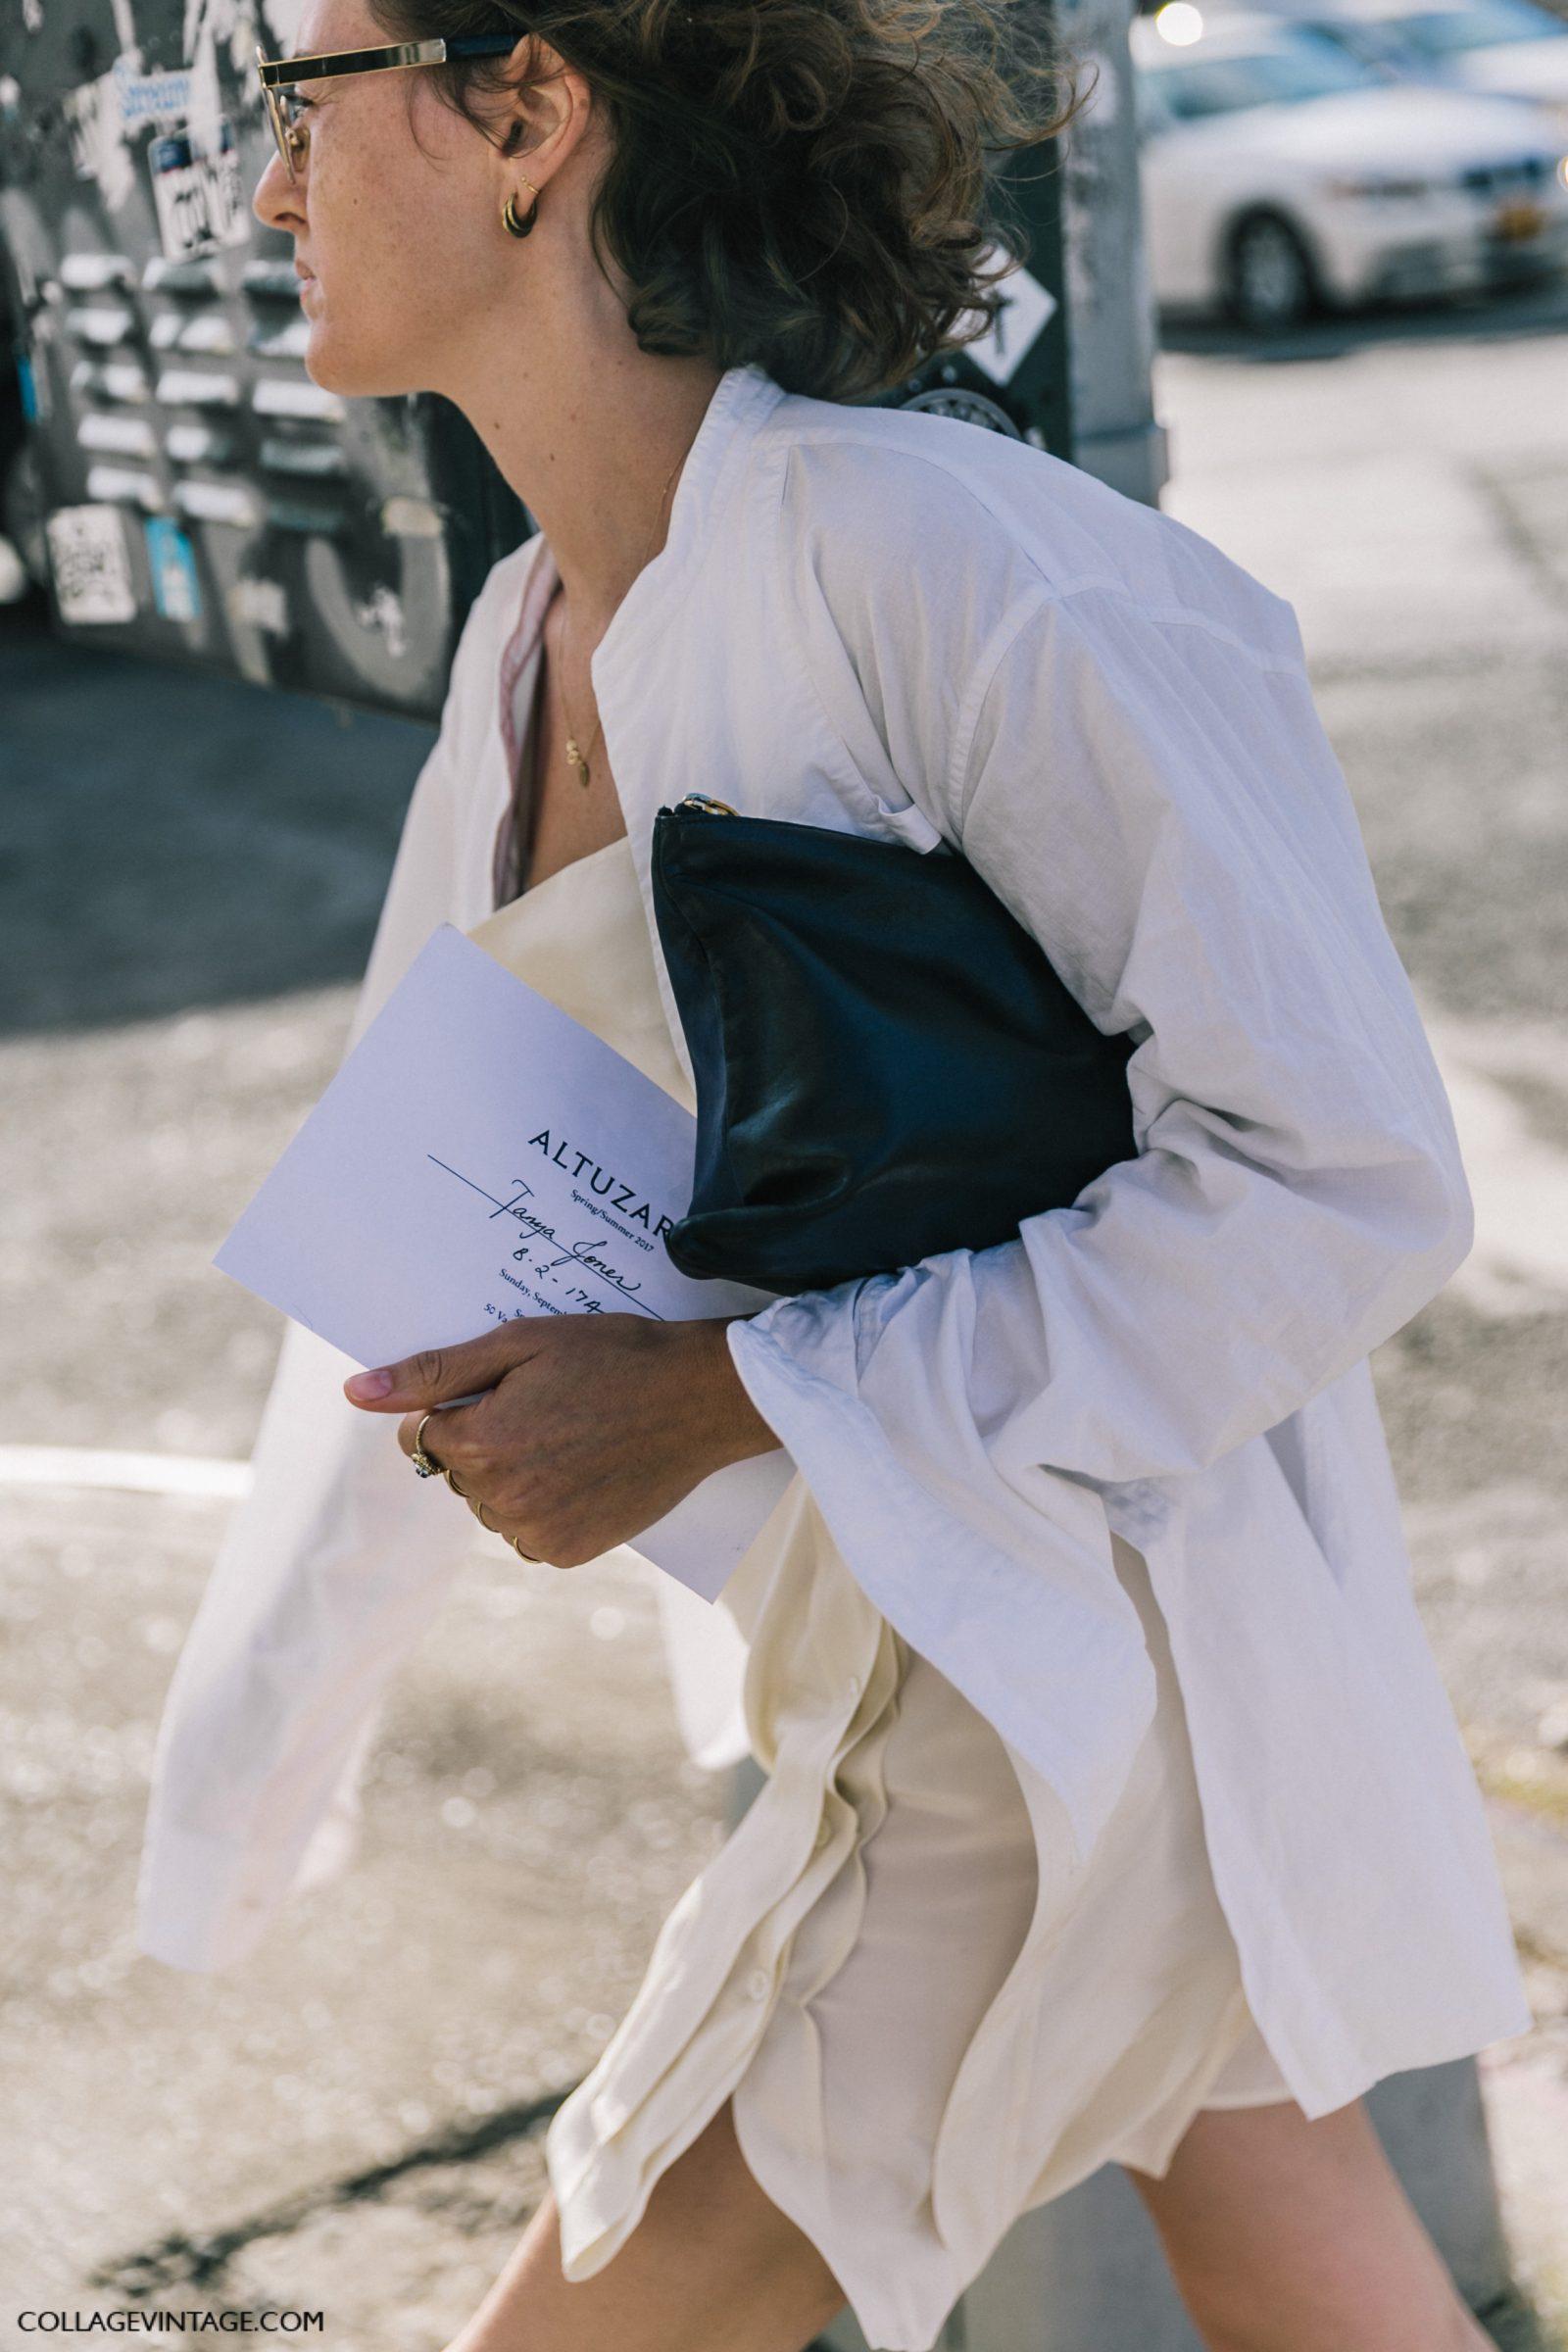 nyfw-new_york_fashion_week_ss17-street_style-outfits-collage_vintage-vintage-atuzarra-65